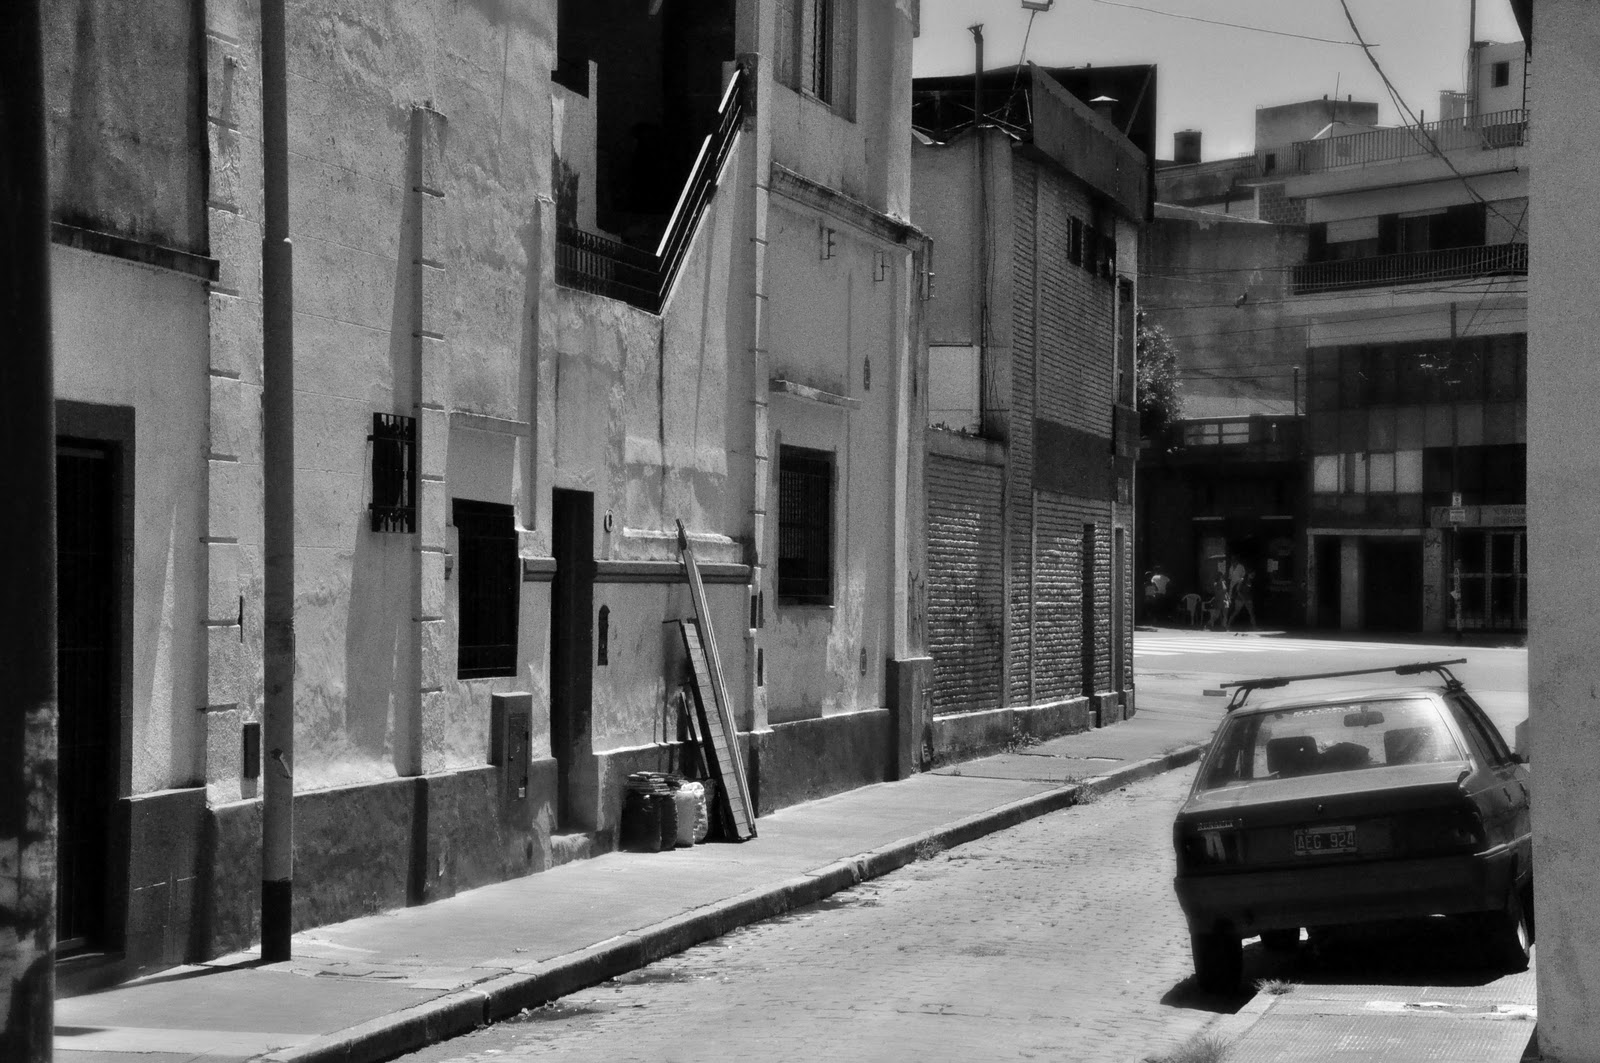 Micaela del barrio 22 de abril tirando goma - 2 9